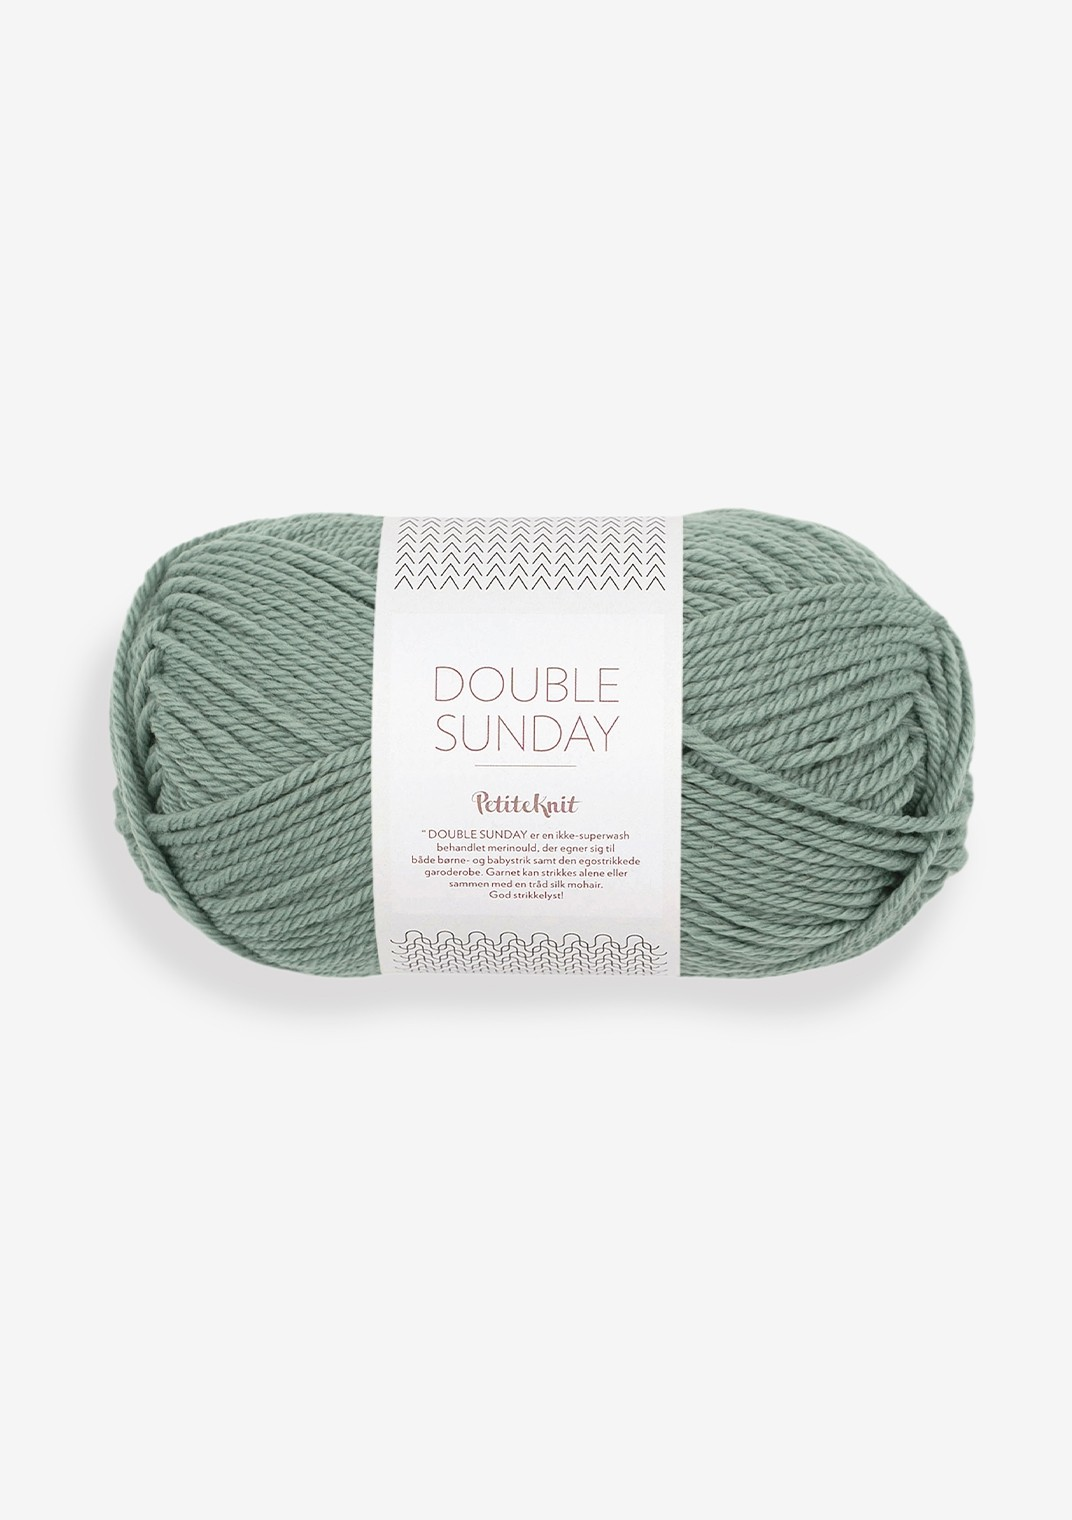 8051 eucalyptus Double Sunday PetiteKnit